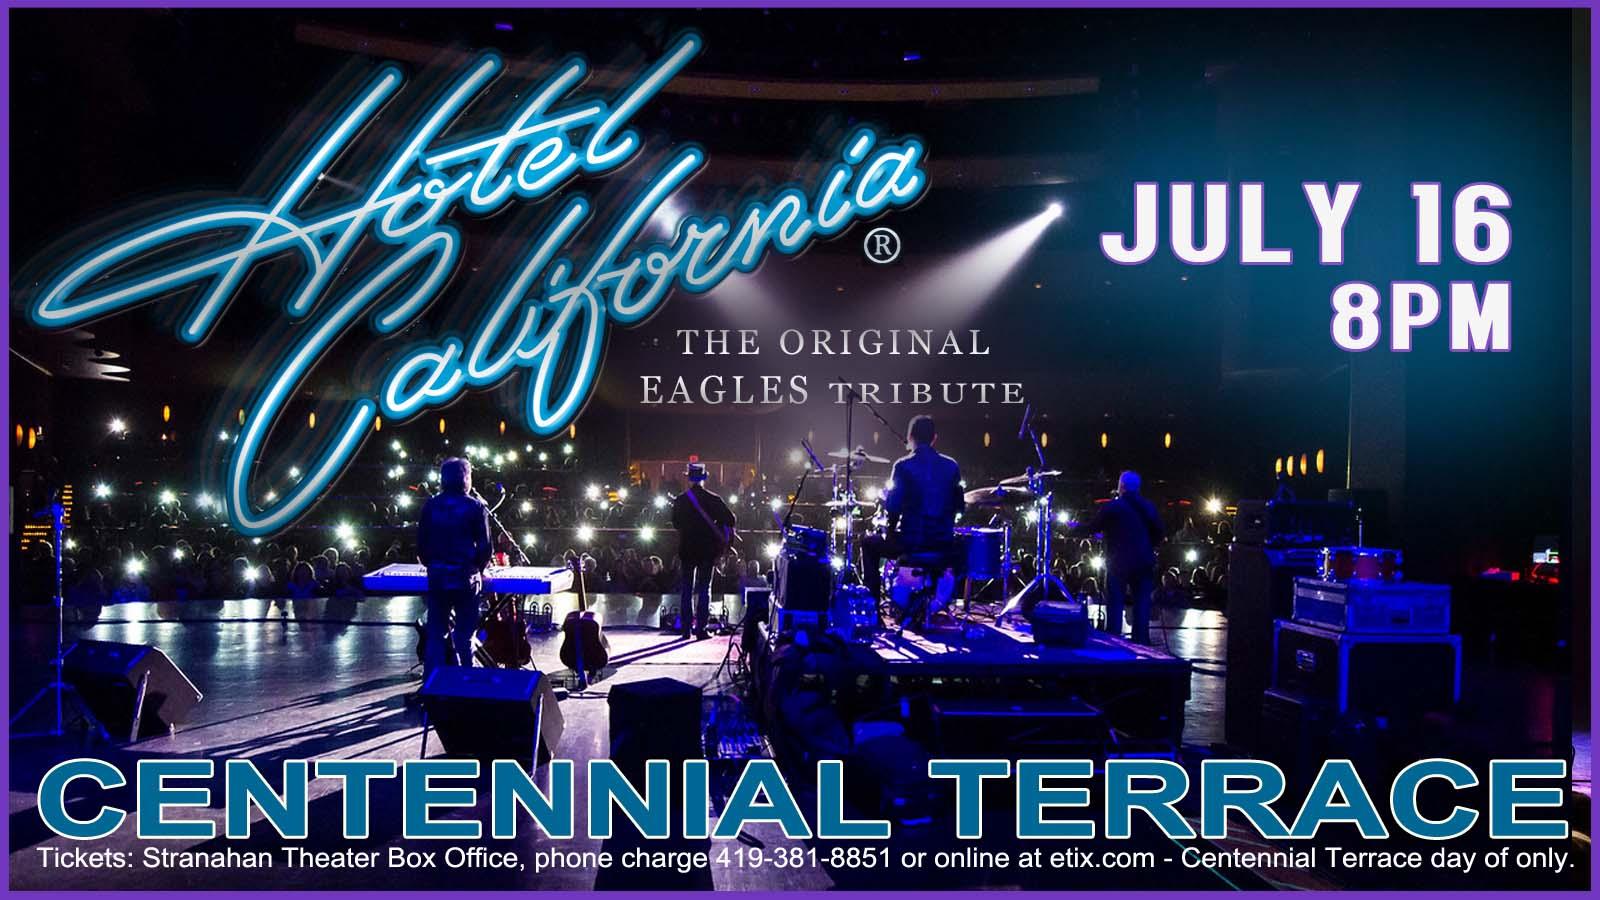 Hotel California – Centennial Terrace – July 16th